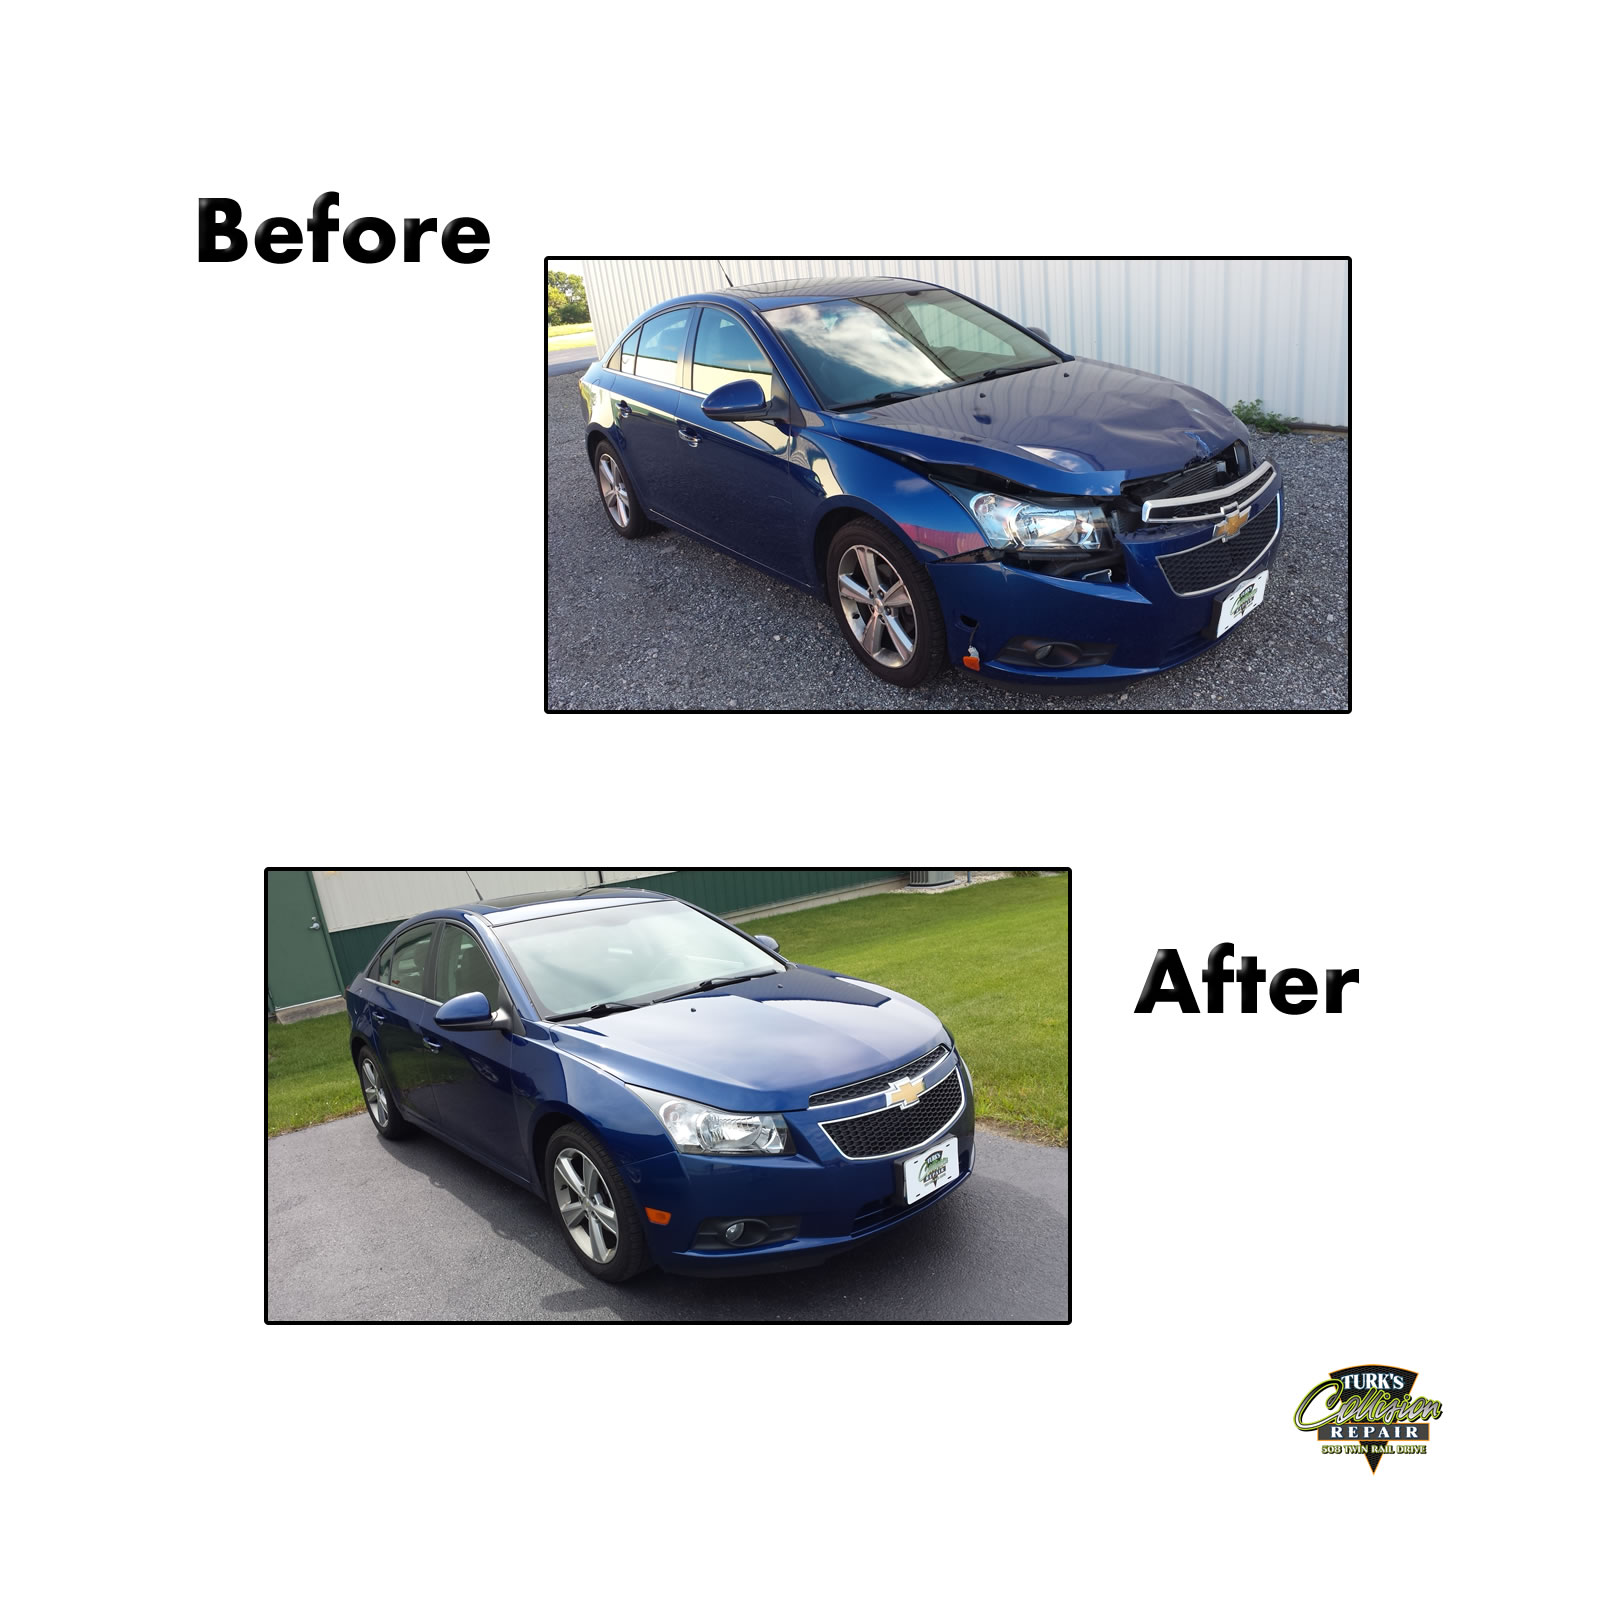 Chevy Cruze Collision Repair